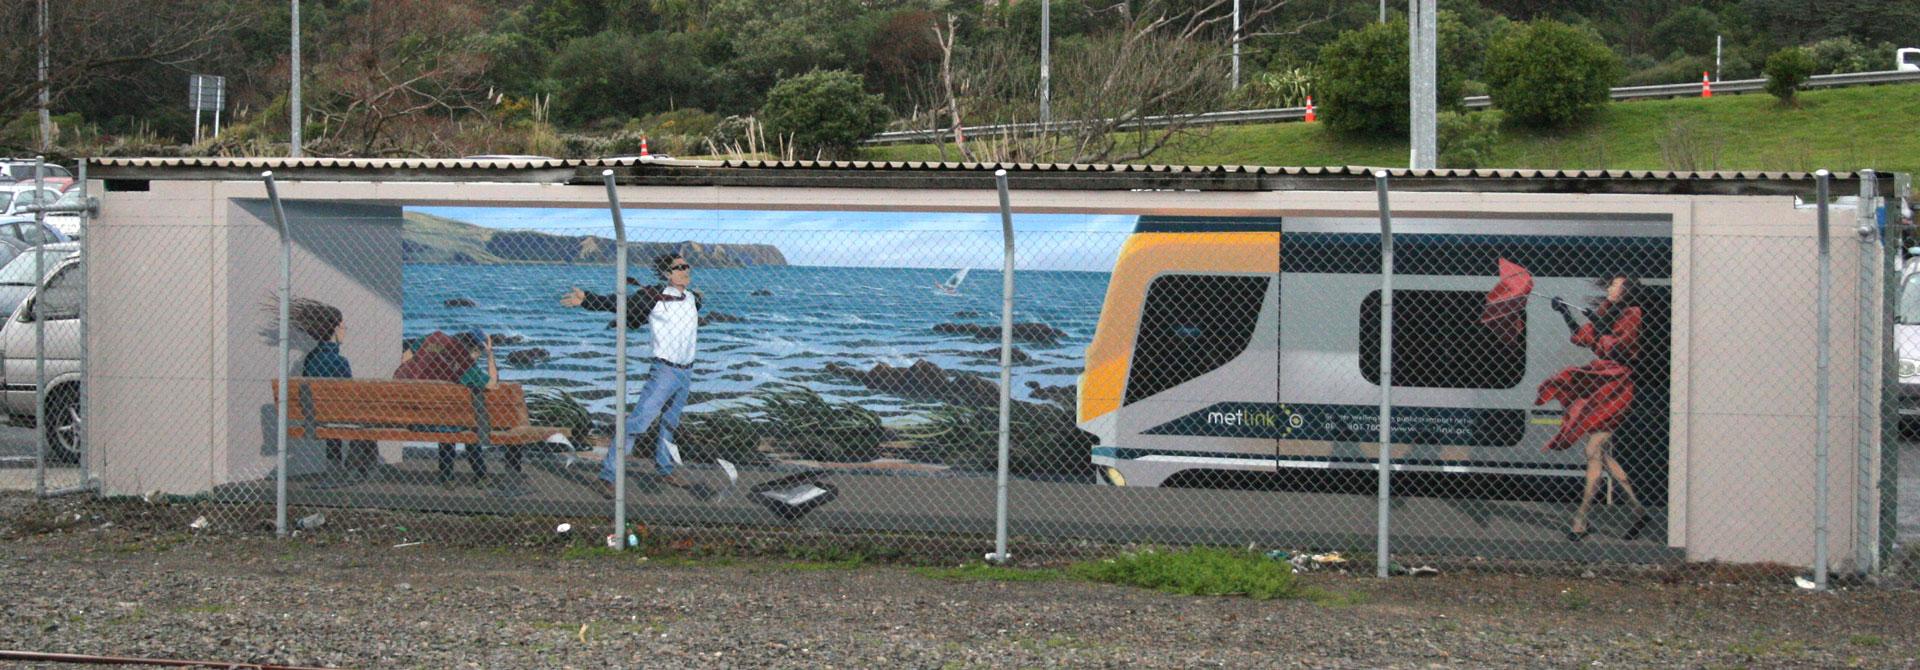 porirua-station-1920x670 Illusion murals